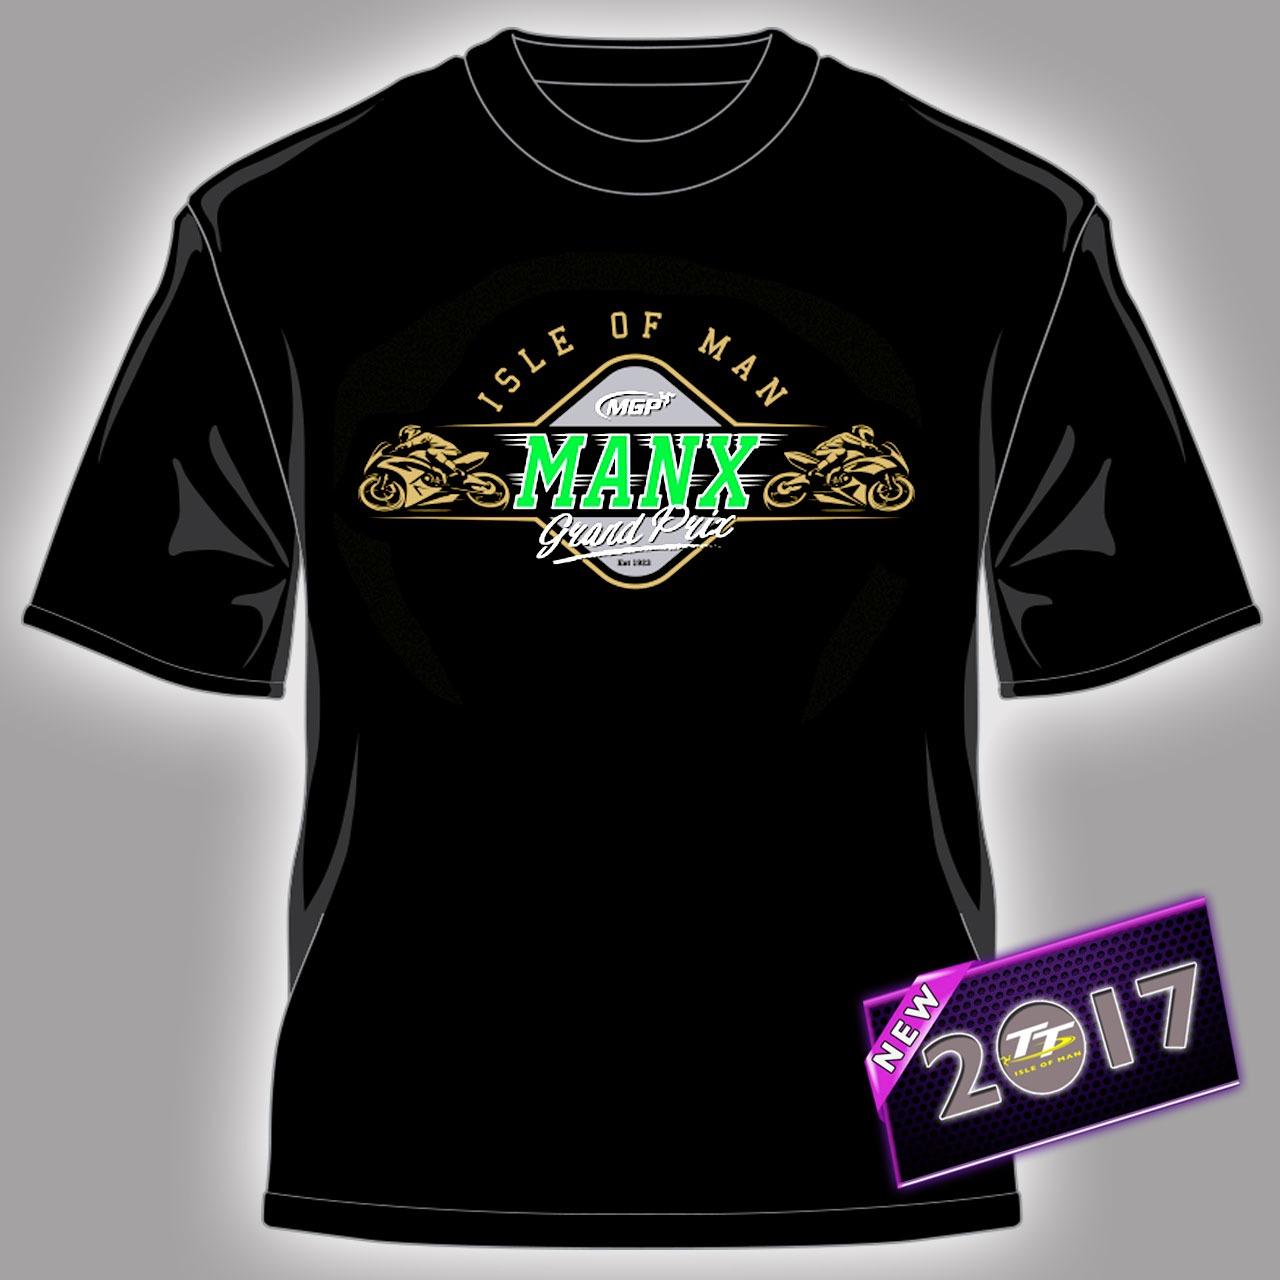 Black keys t shirt uk - Buy Now Official Manx Grand Prix T Shirt 17mgp Ats2